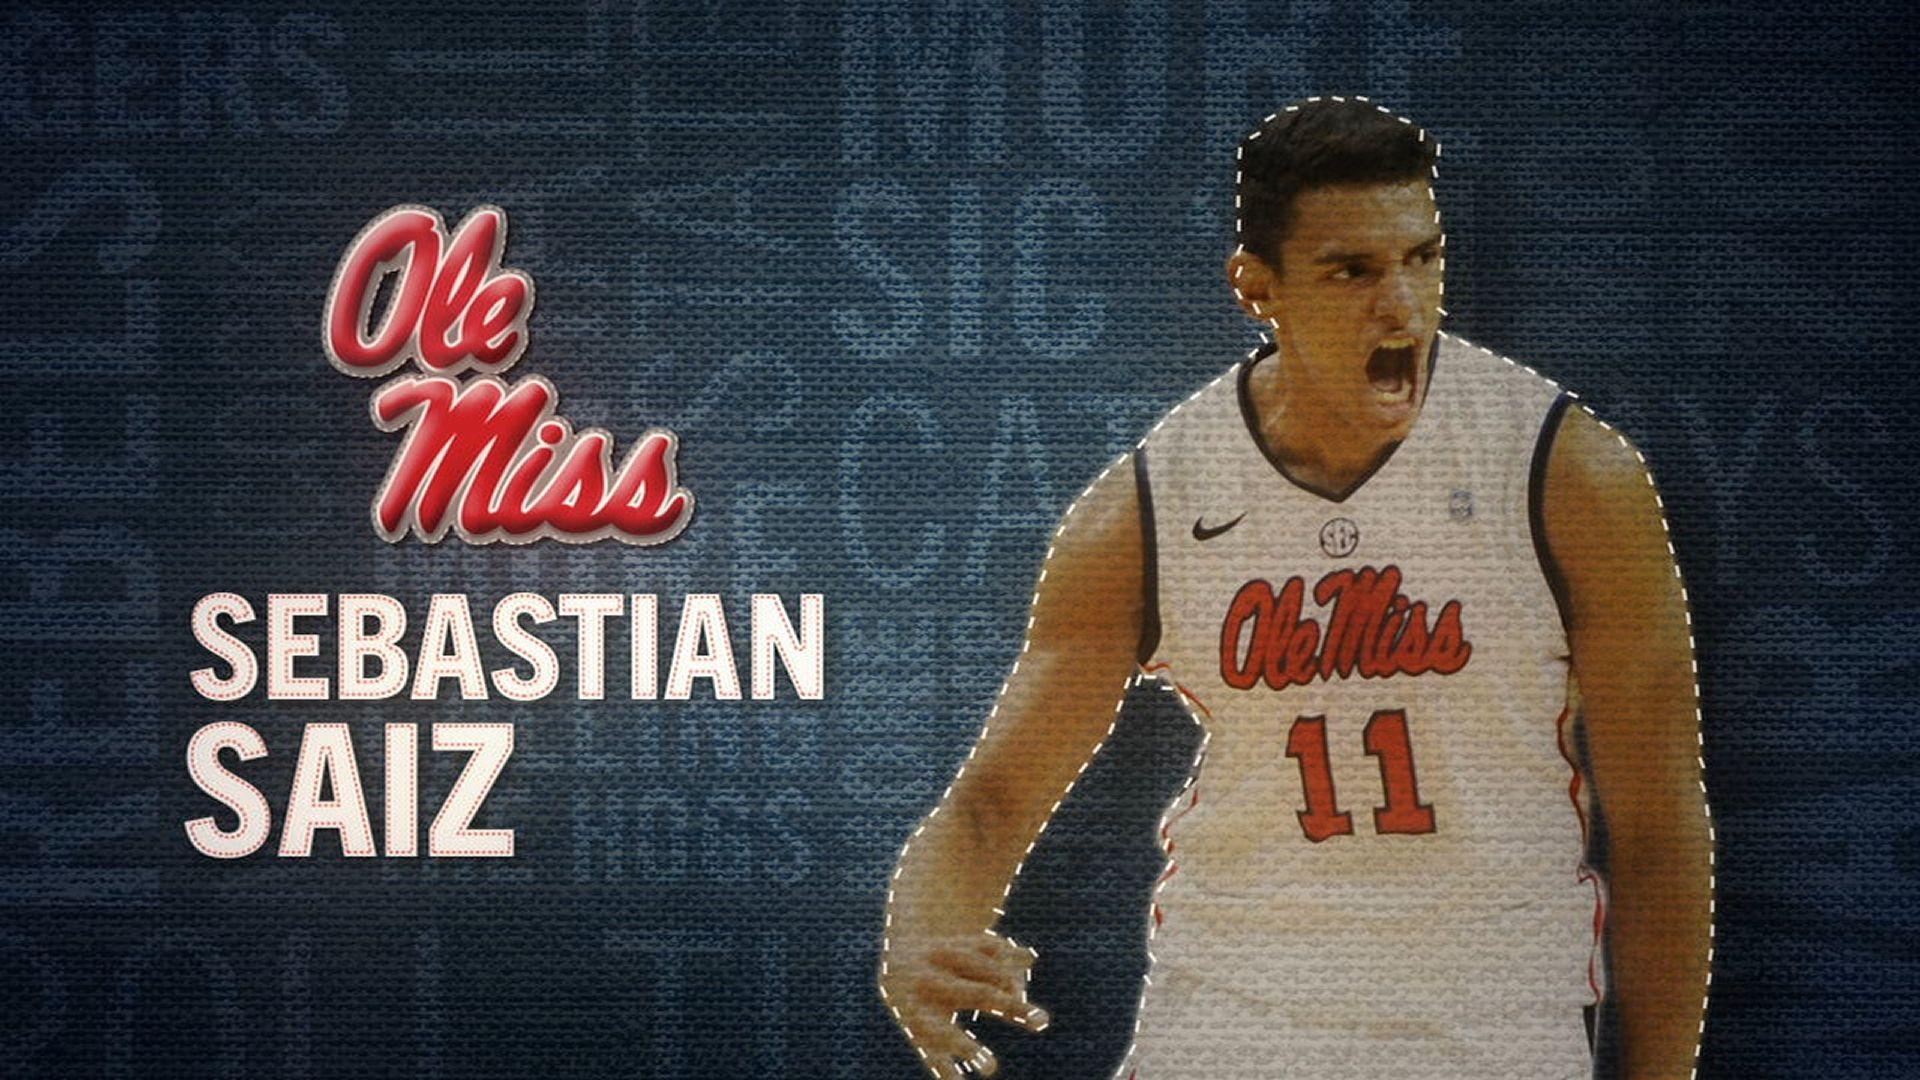 I am the SEC: Ole Miss' Sebastian Saiz